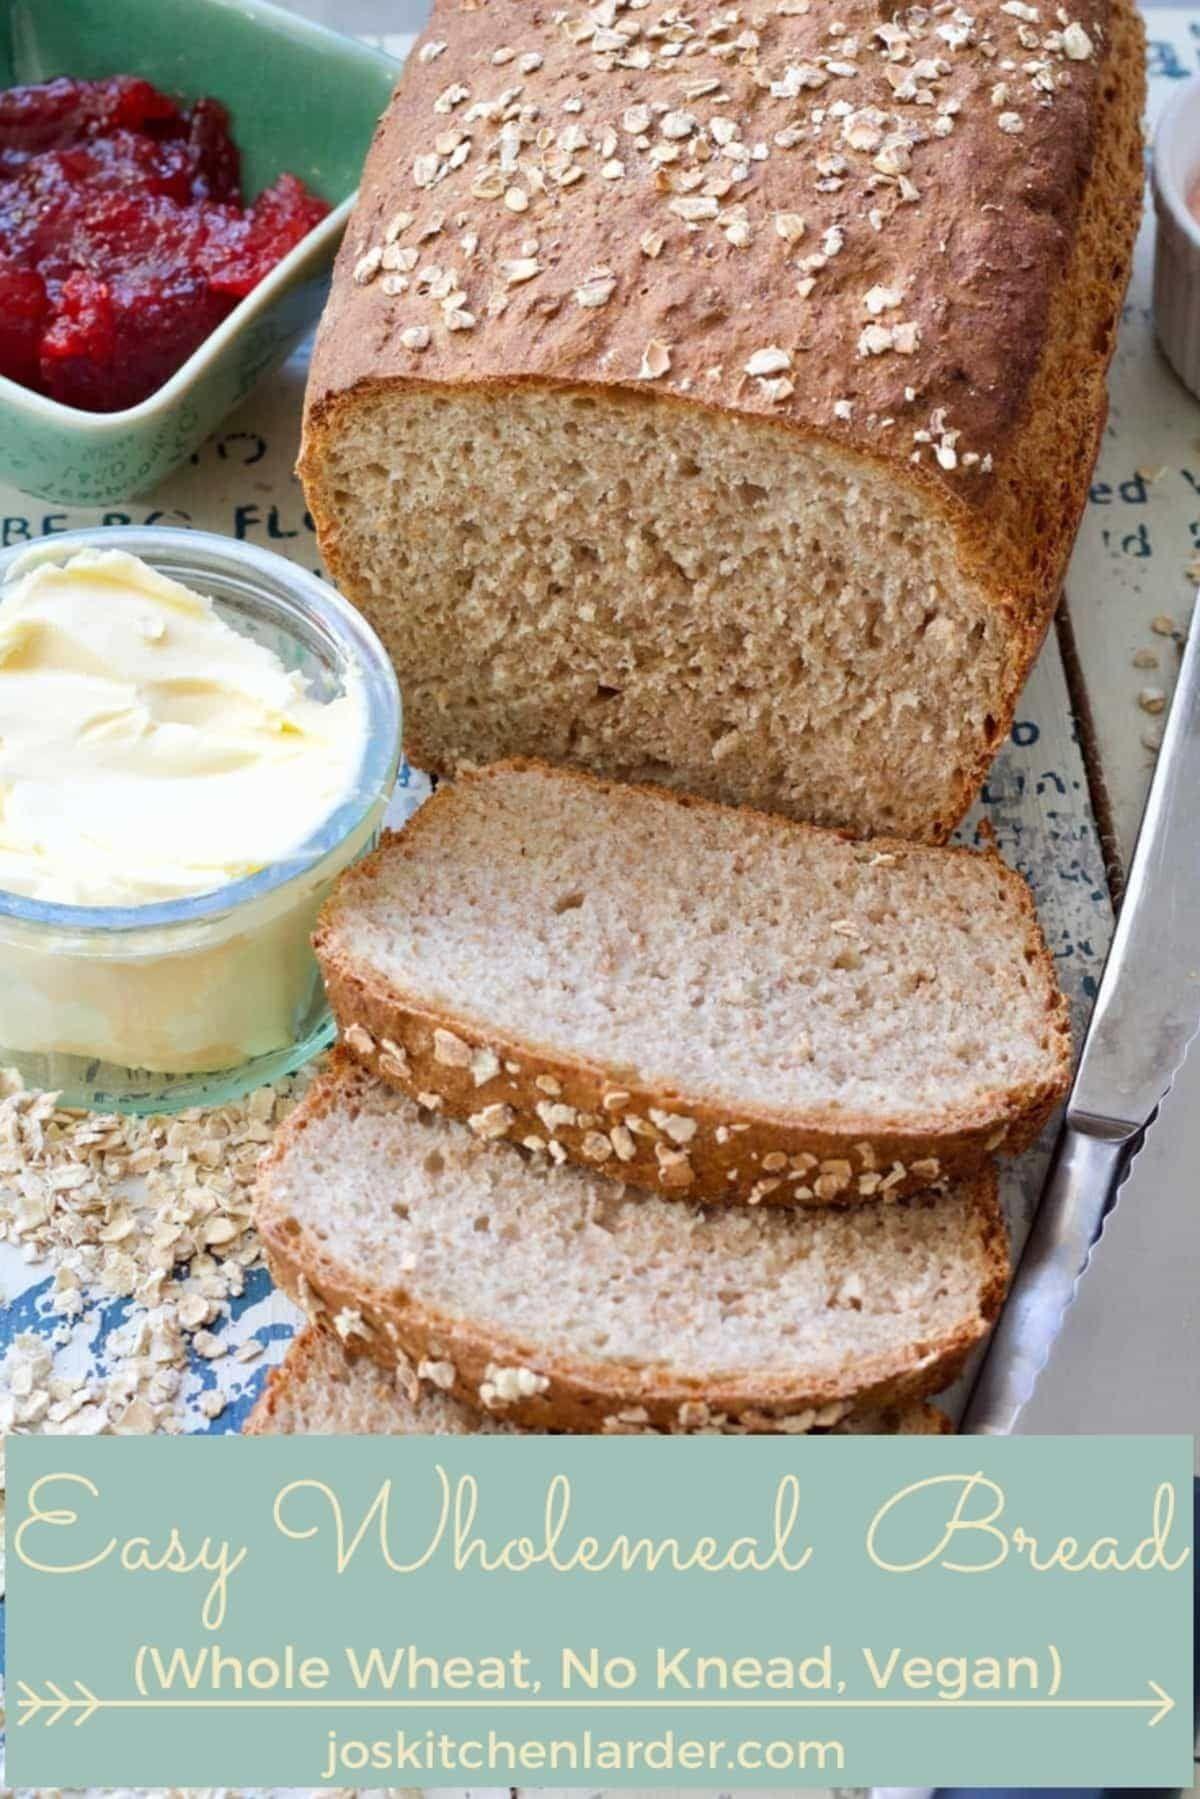 Easy Wholemeal Bread Recipe No Knead Recipe Wholemeal Bread Recipe Homemade Sandwich Bread Recipes Homemade